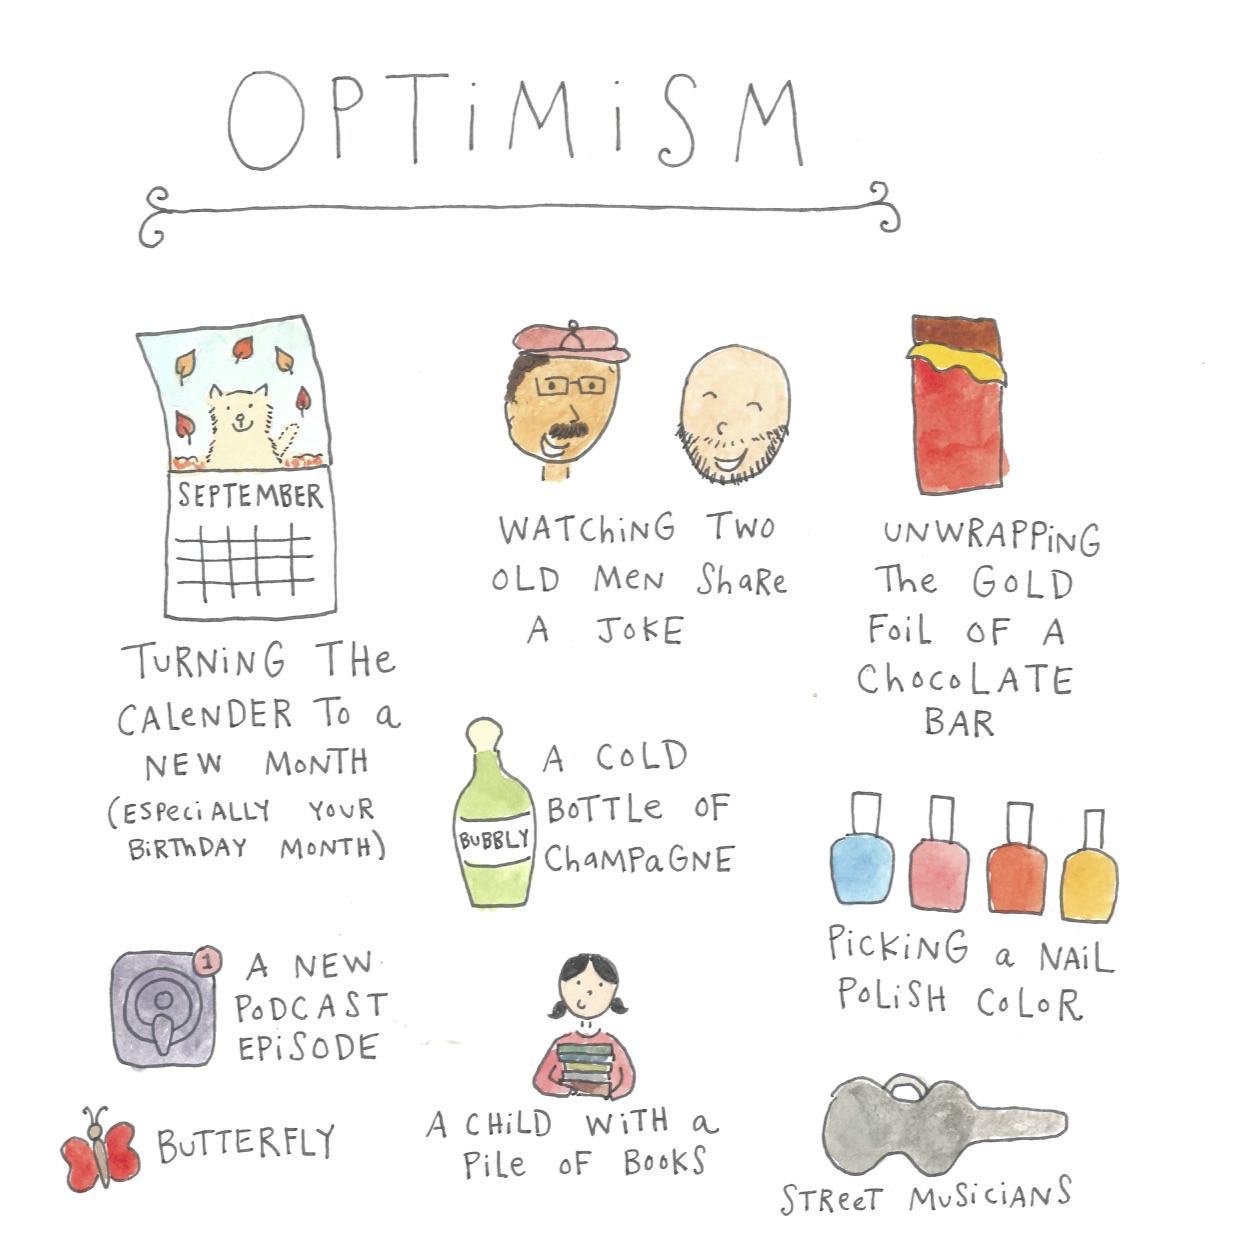 Optimism illustration by Mari Andrew